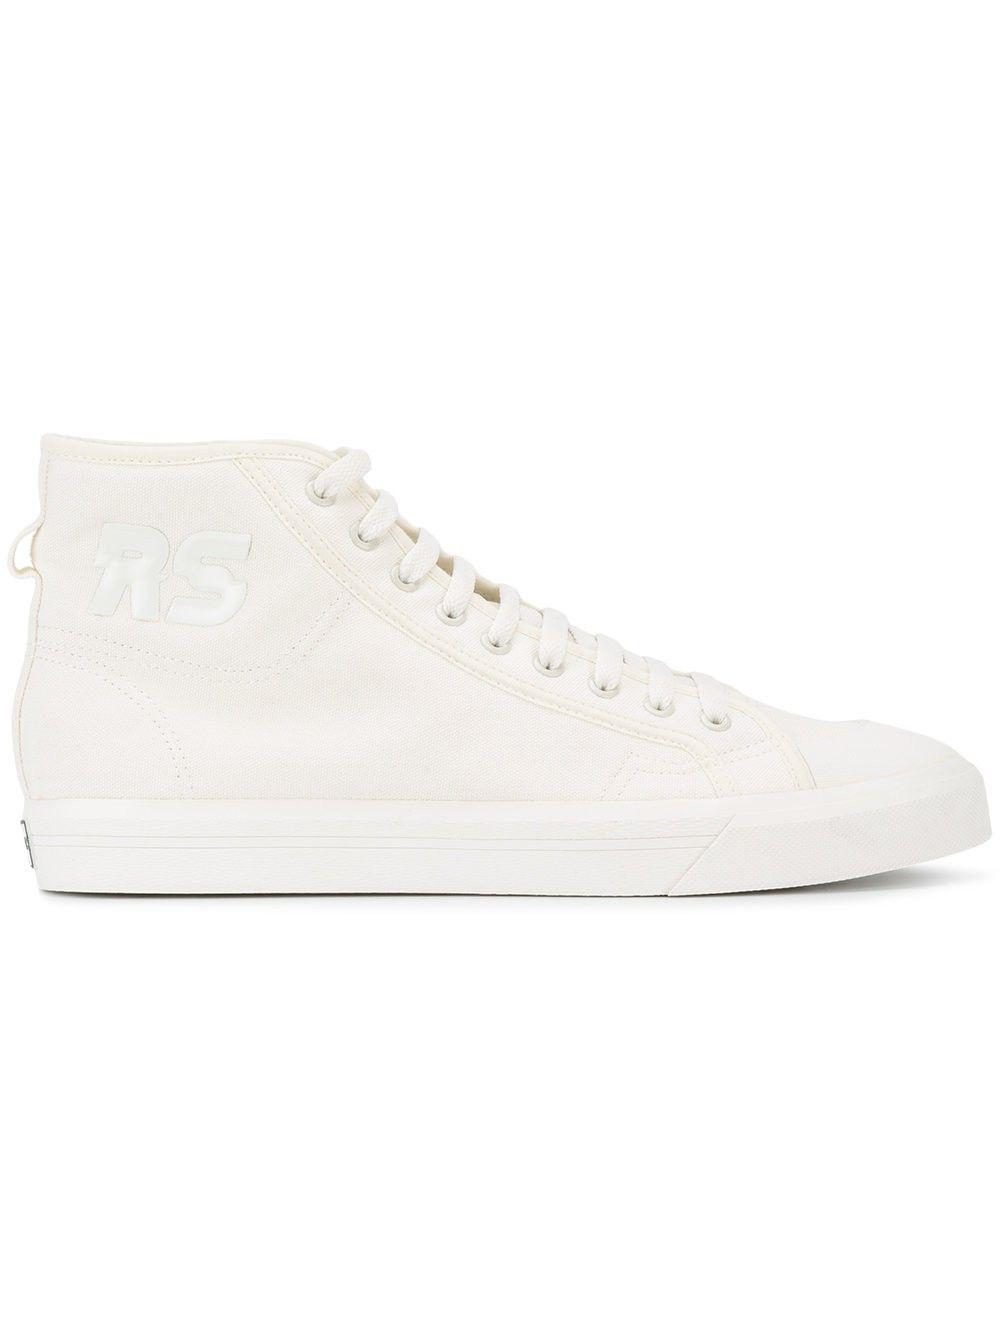 ADIDAS BY RAF SIMONS Spirit High-Top Sneakers. #adidasbyrafsimons #shoes #